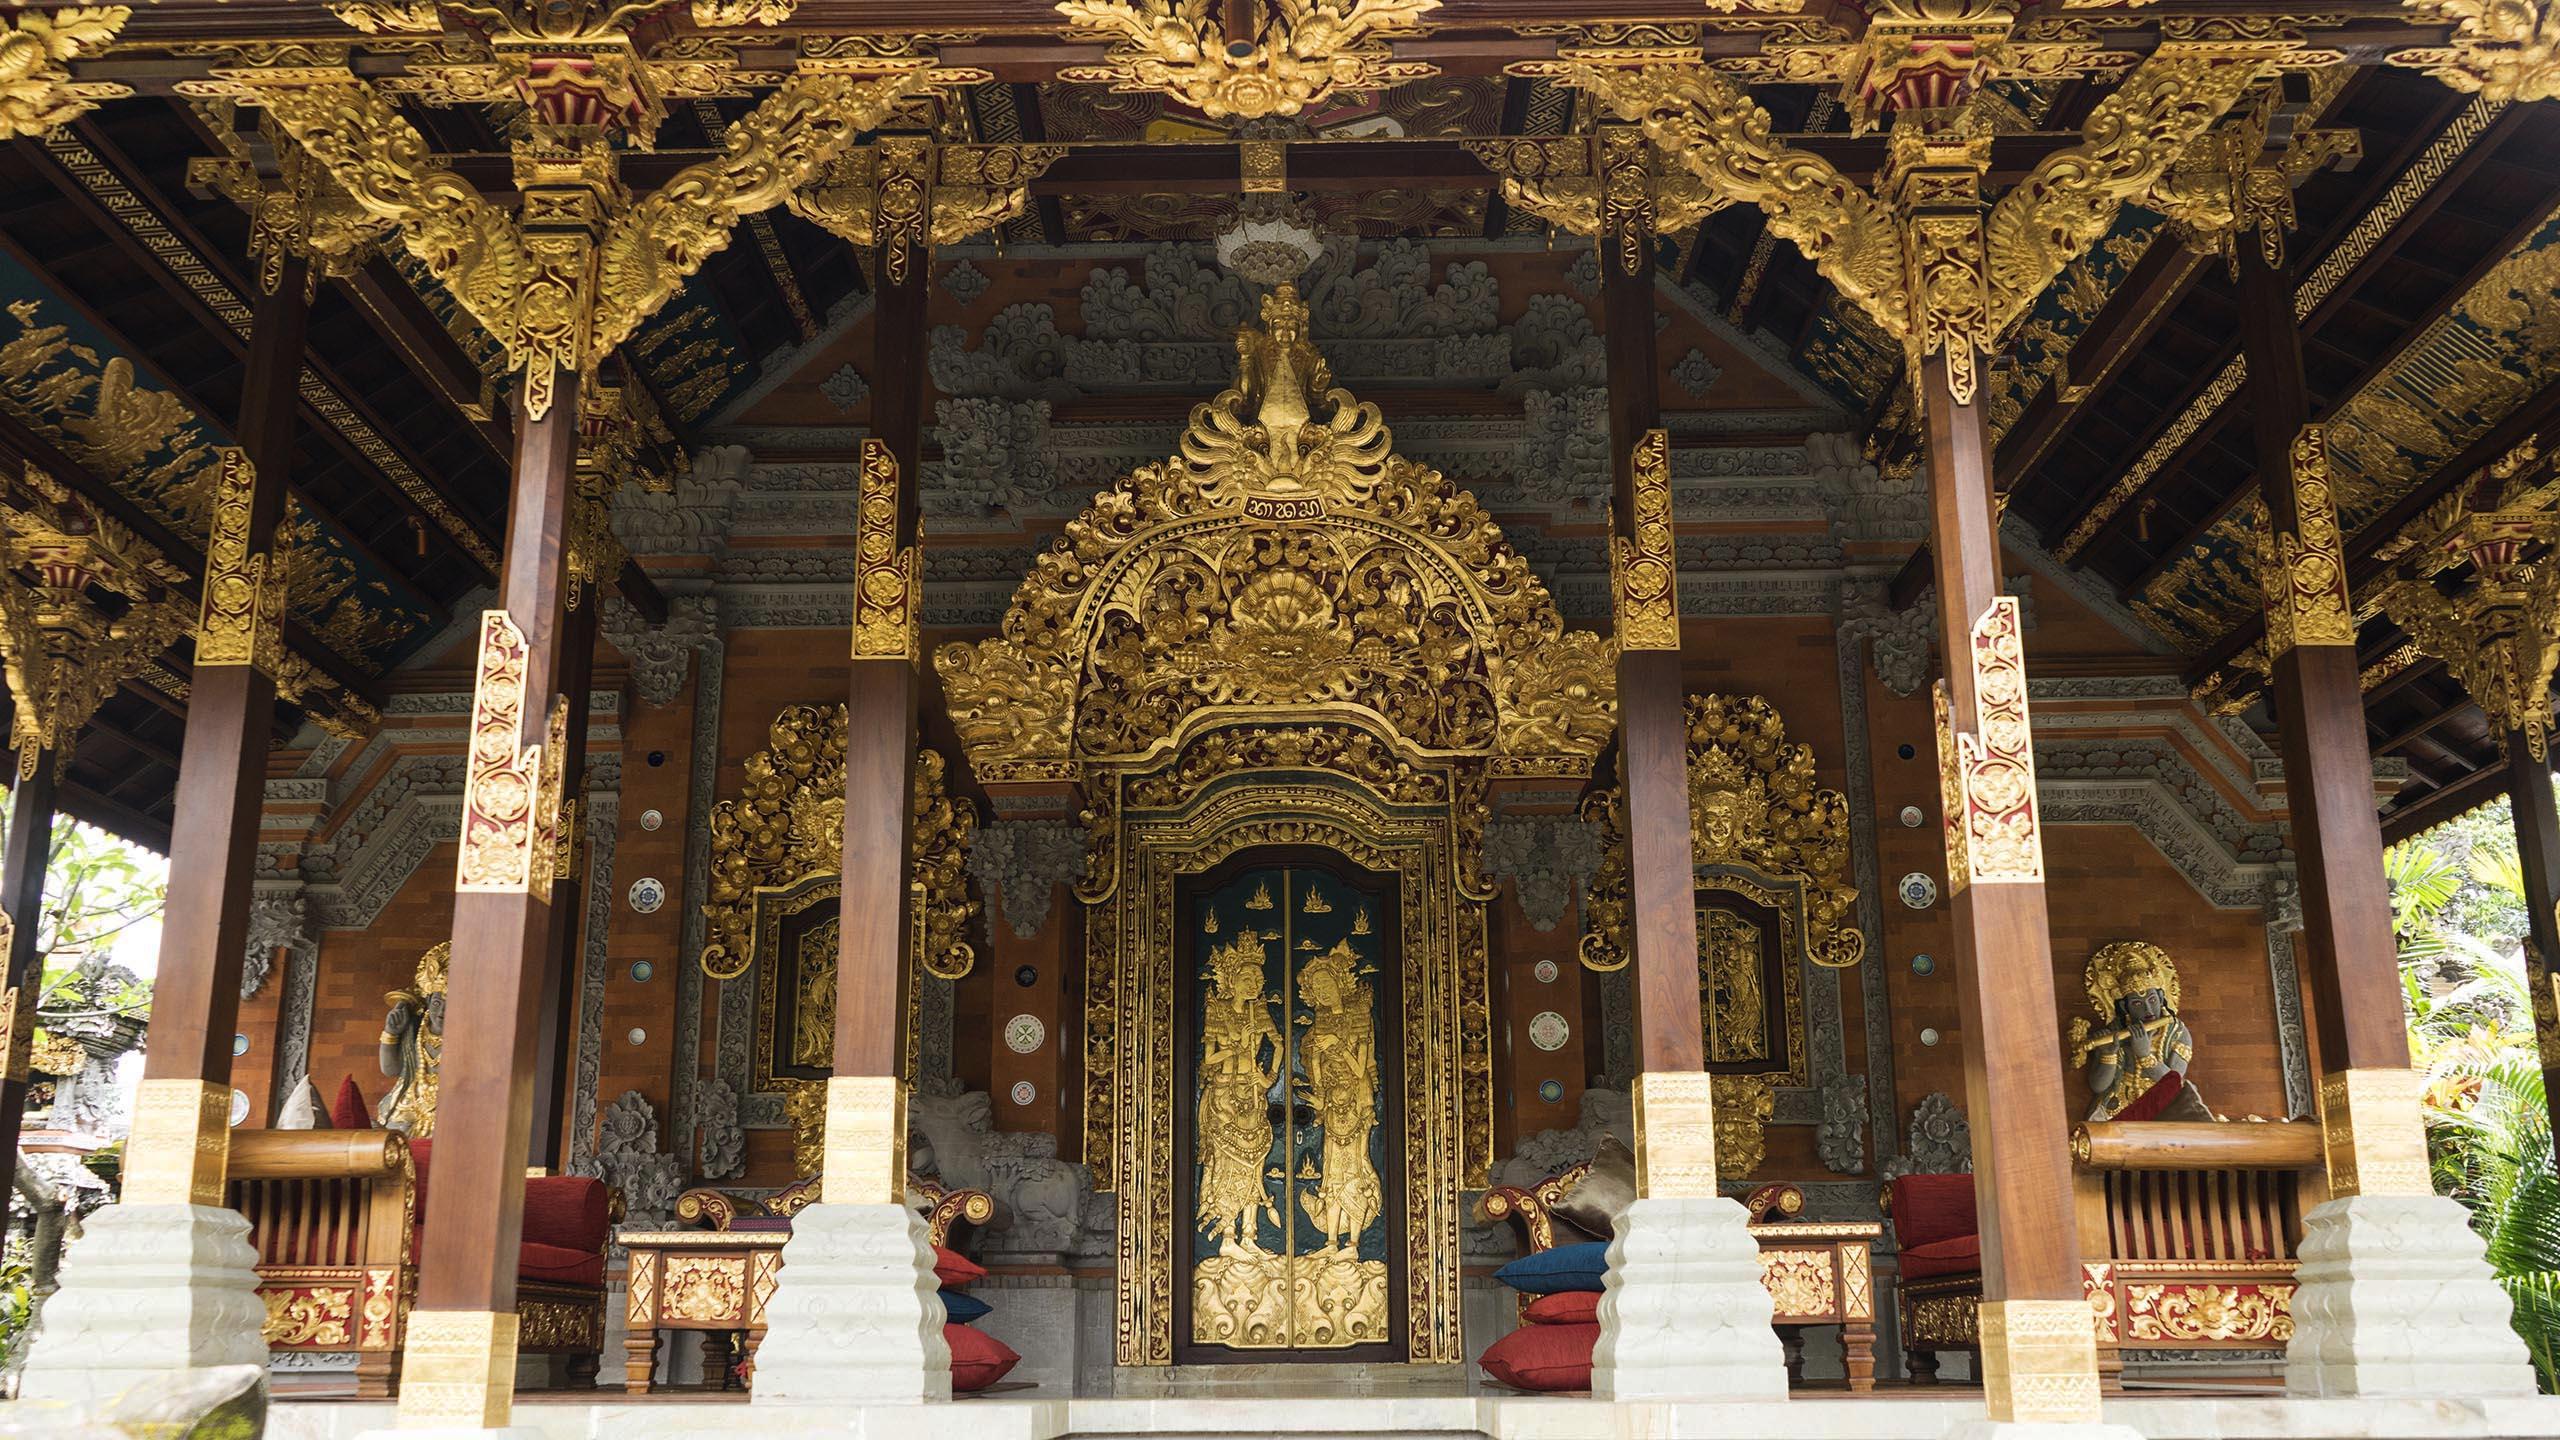 Voyage luxe sur mesure en Indonésie et Bali